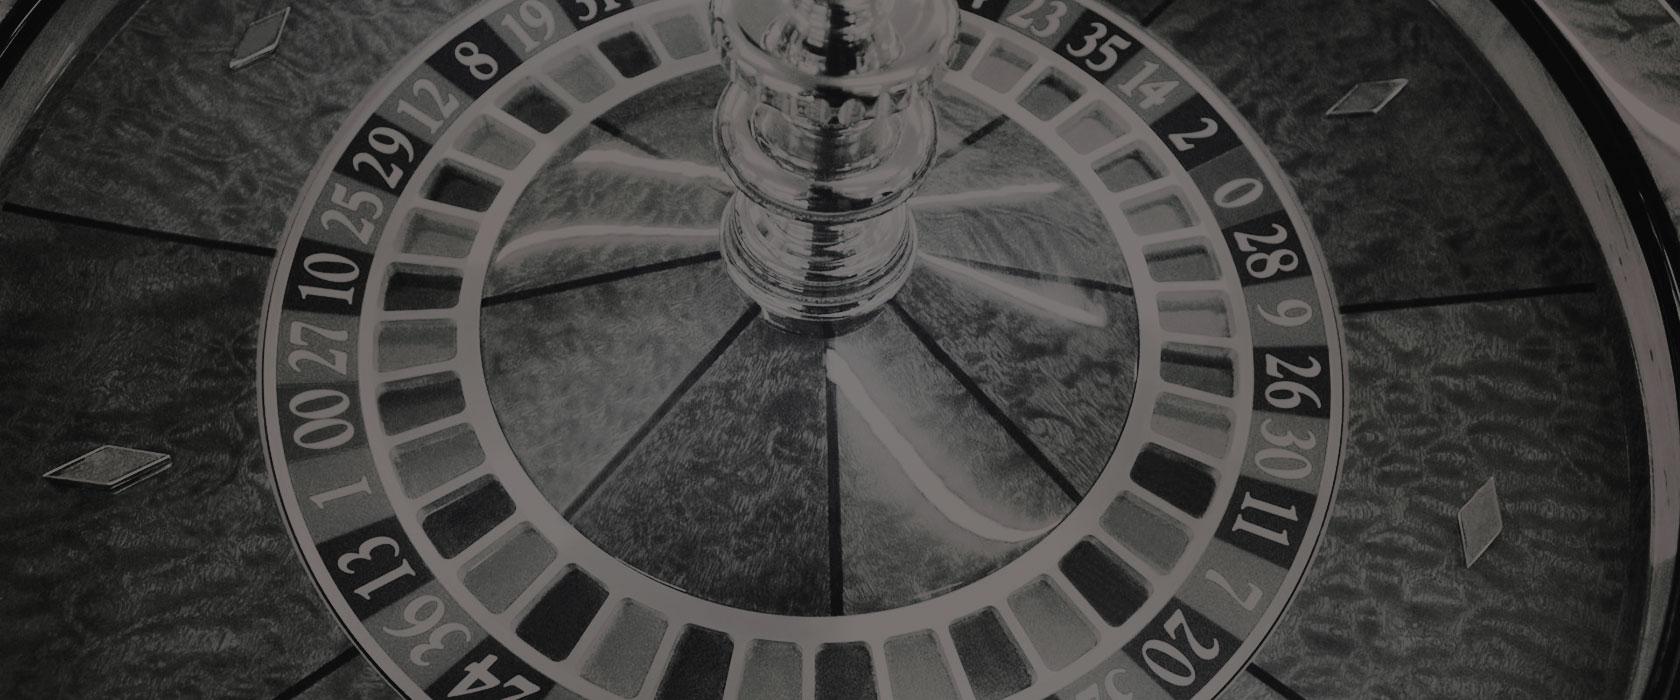 Spela ansvarsfullt - Casinobonusar.nu